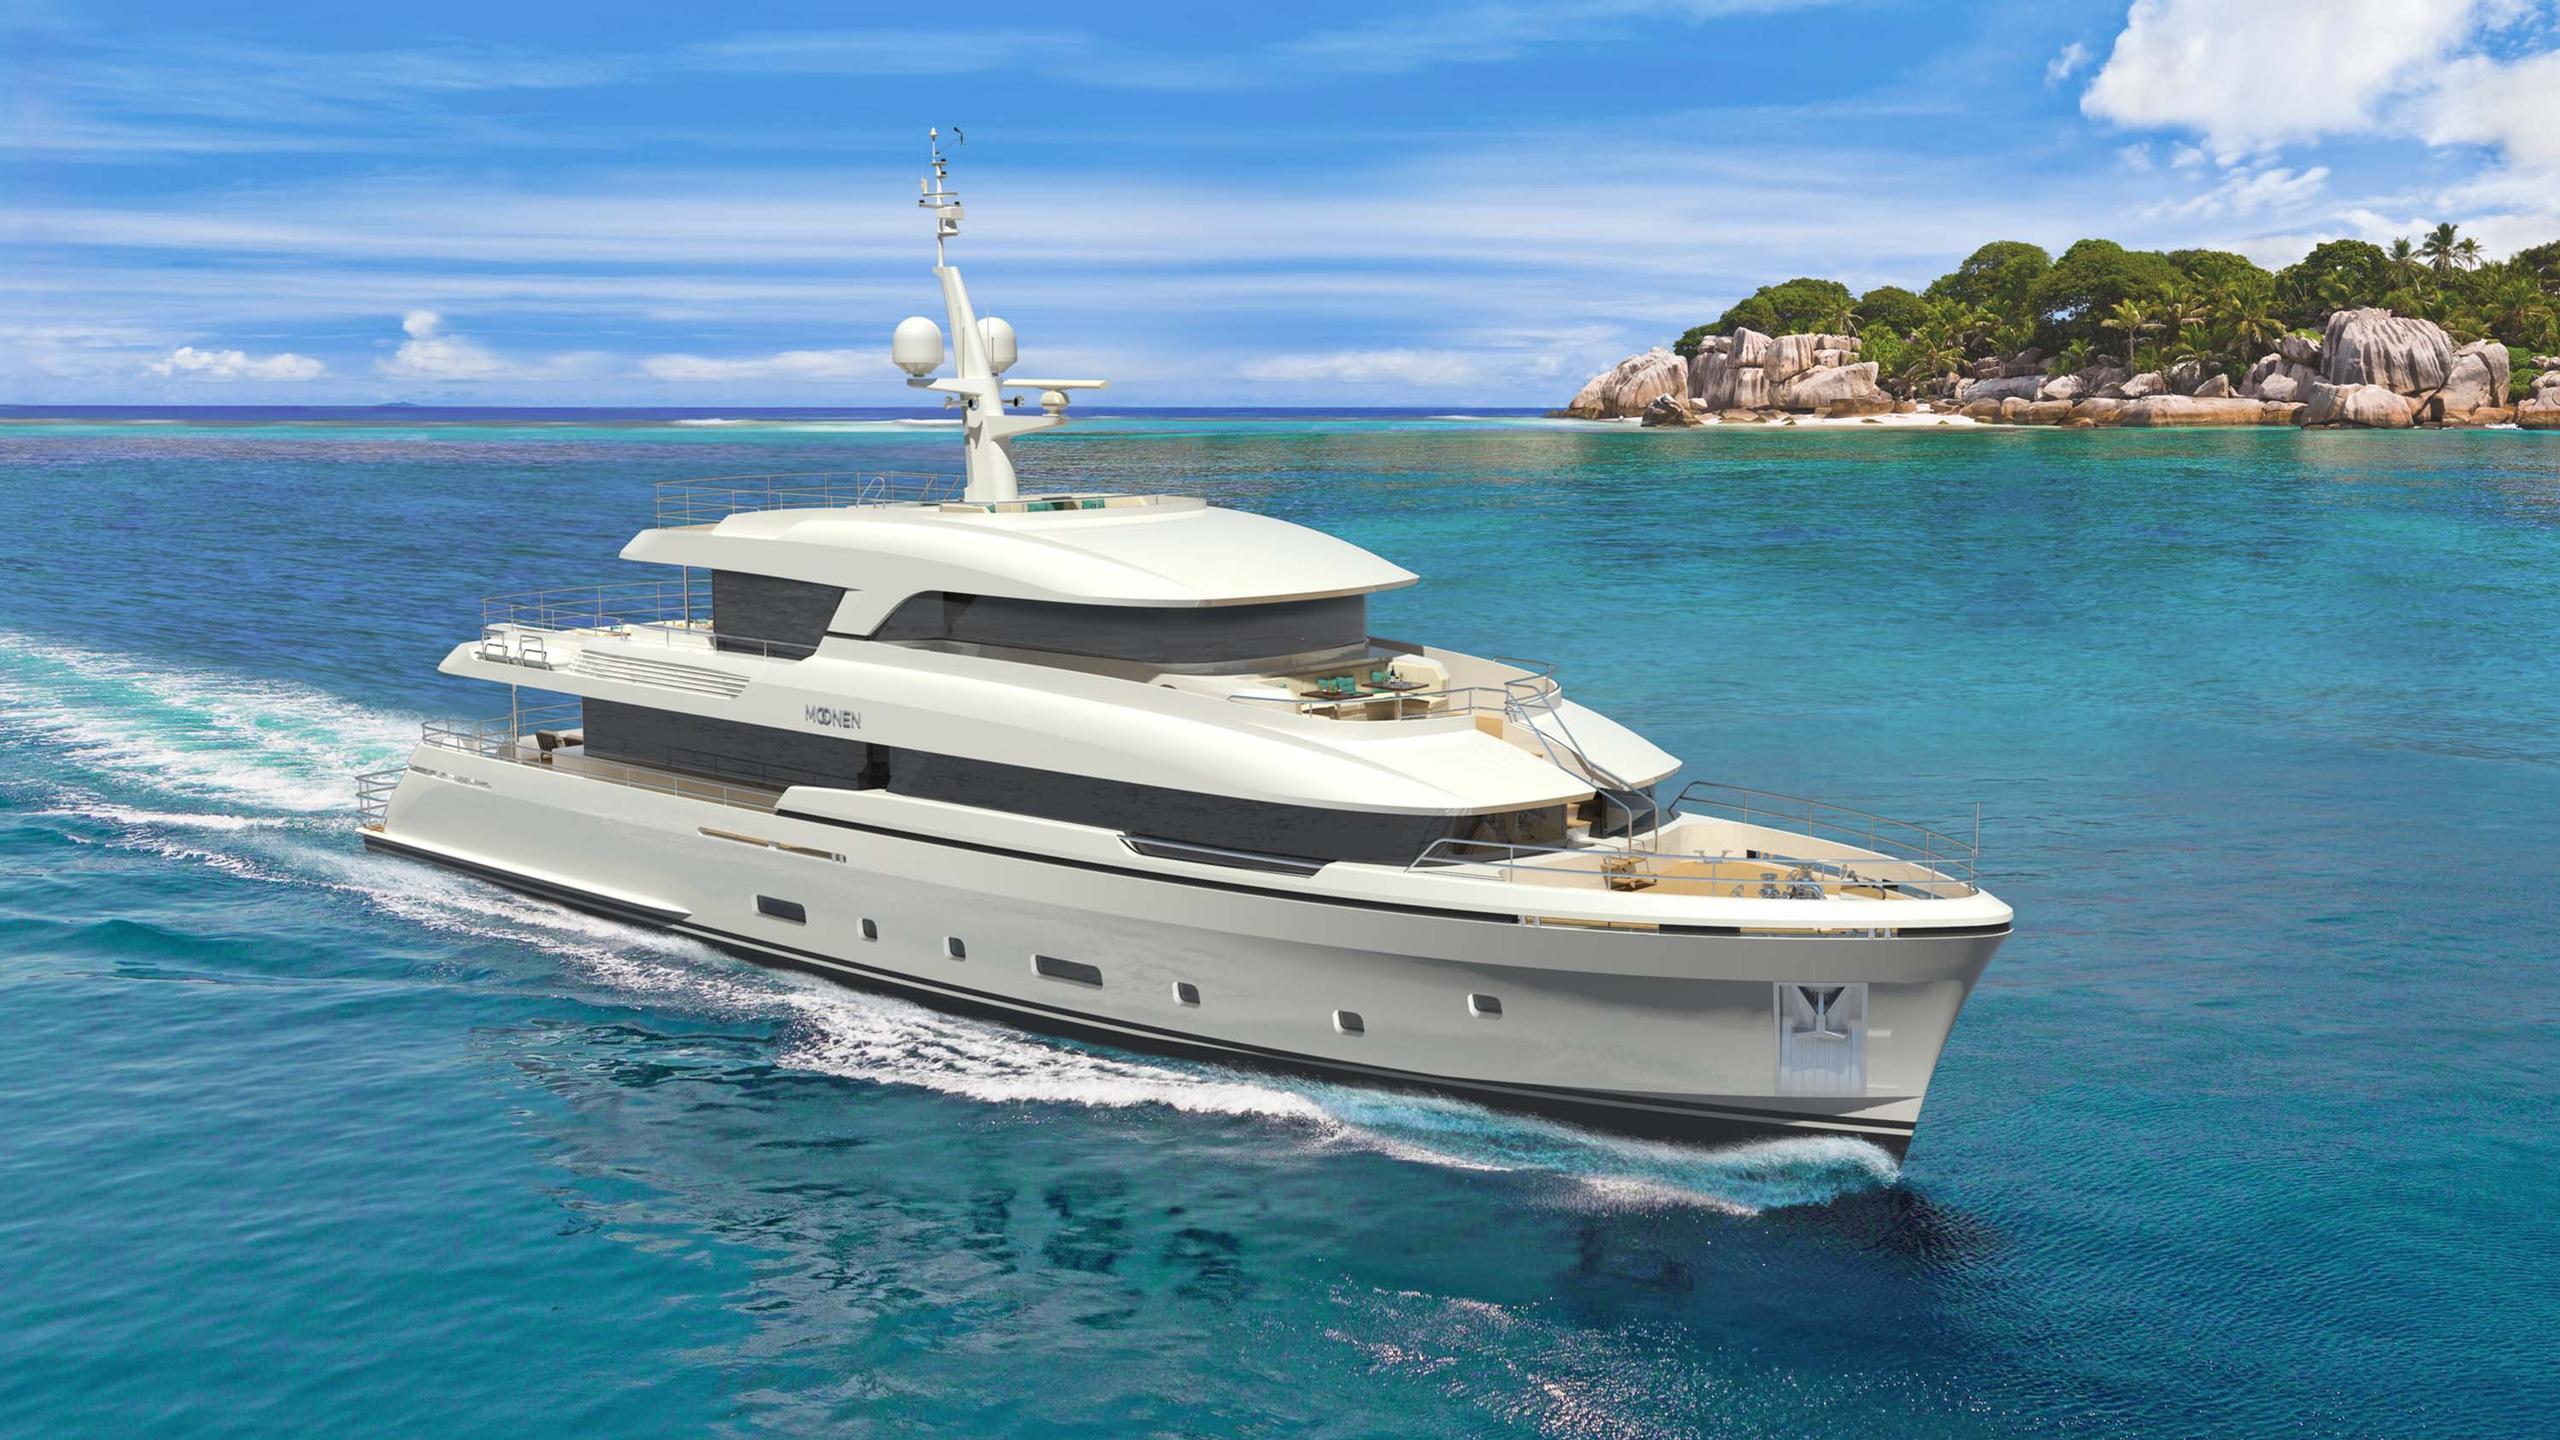 martinique motoryacht moonen 2018 36m rendering front profile cruising